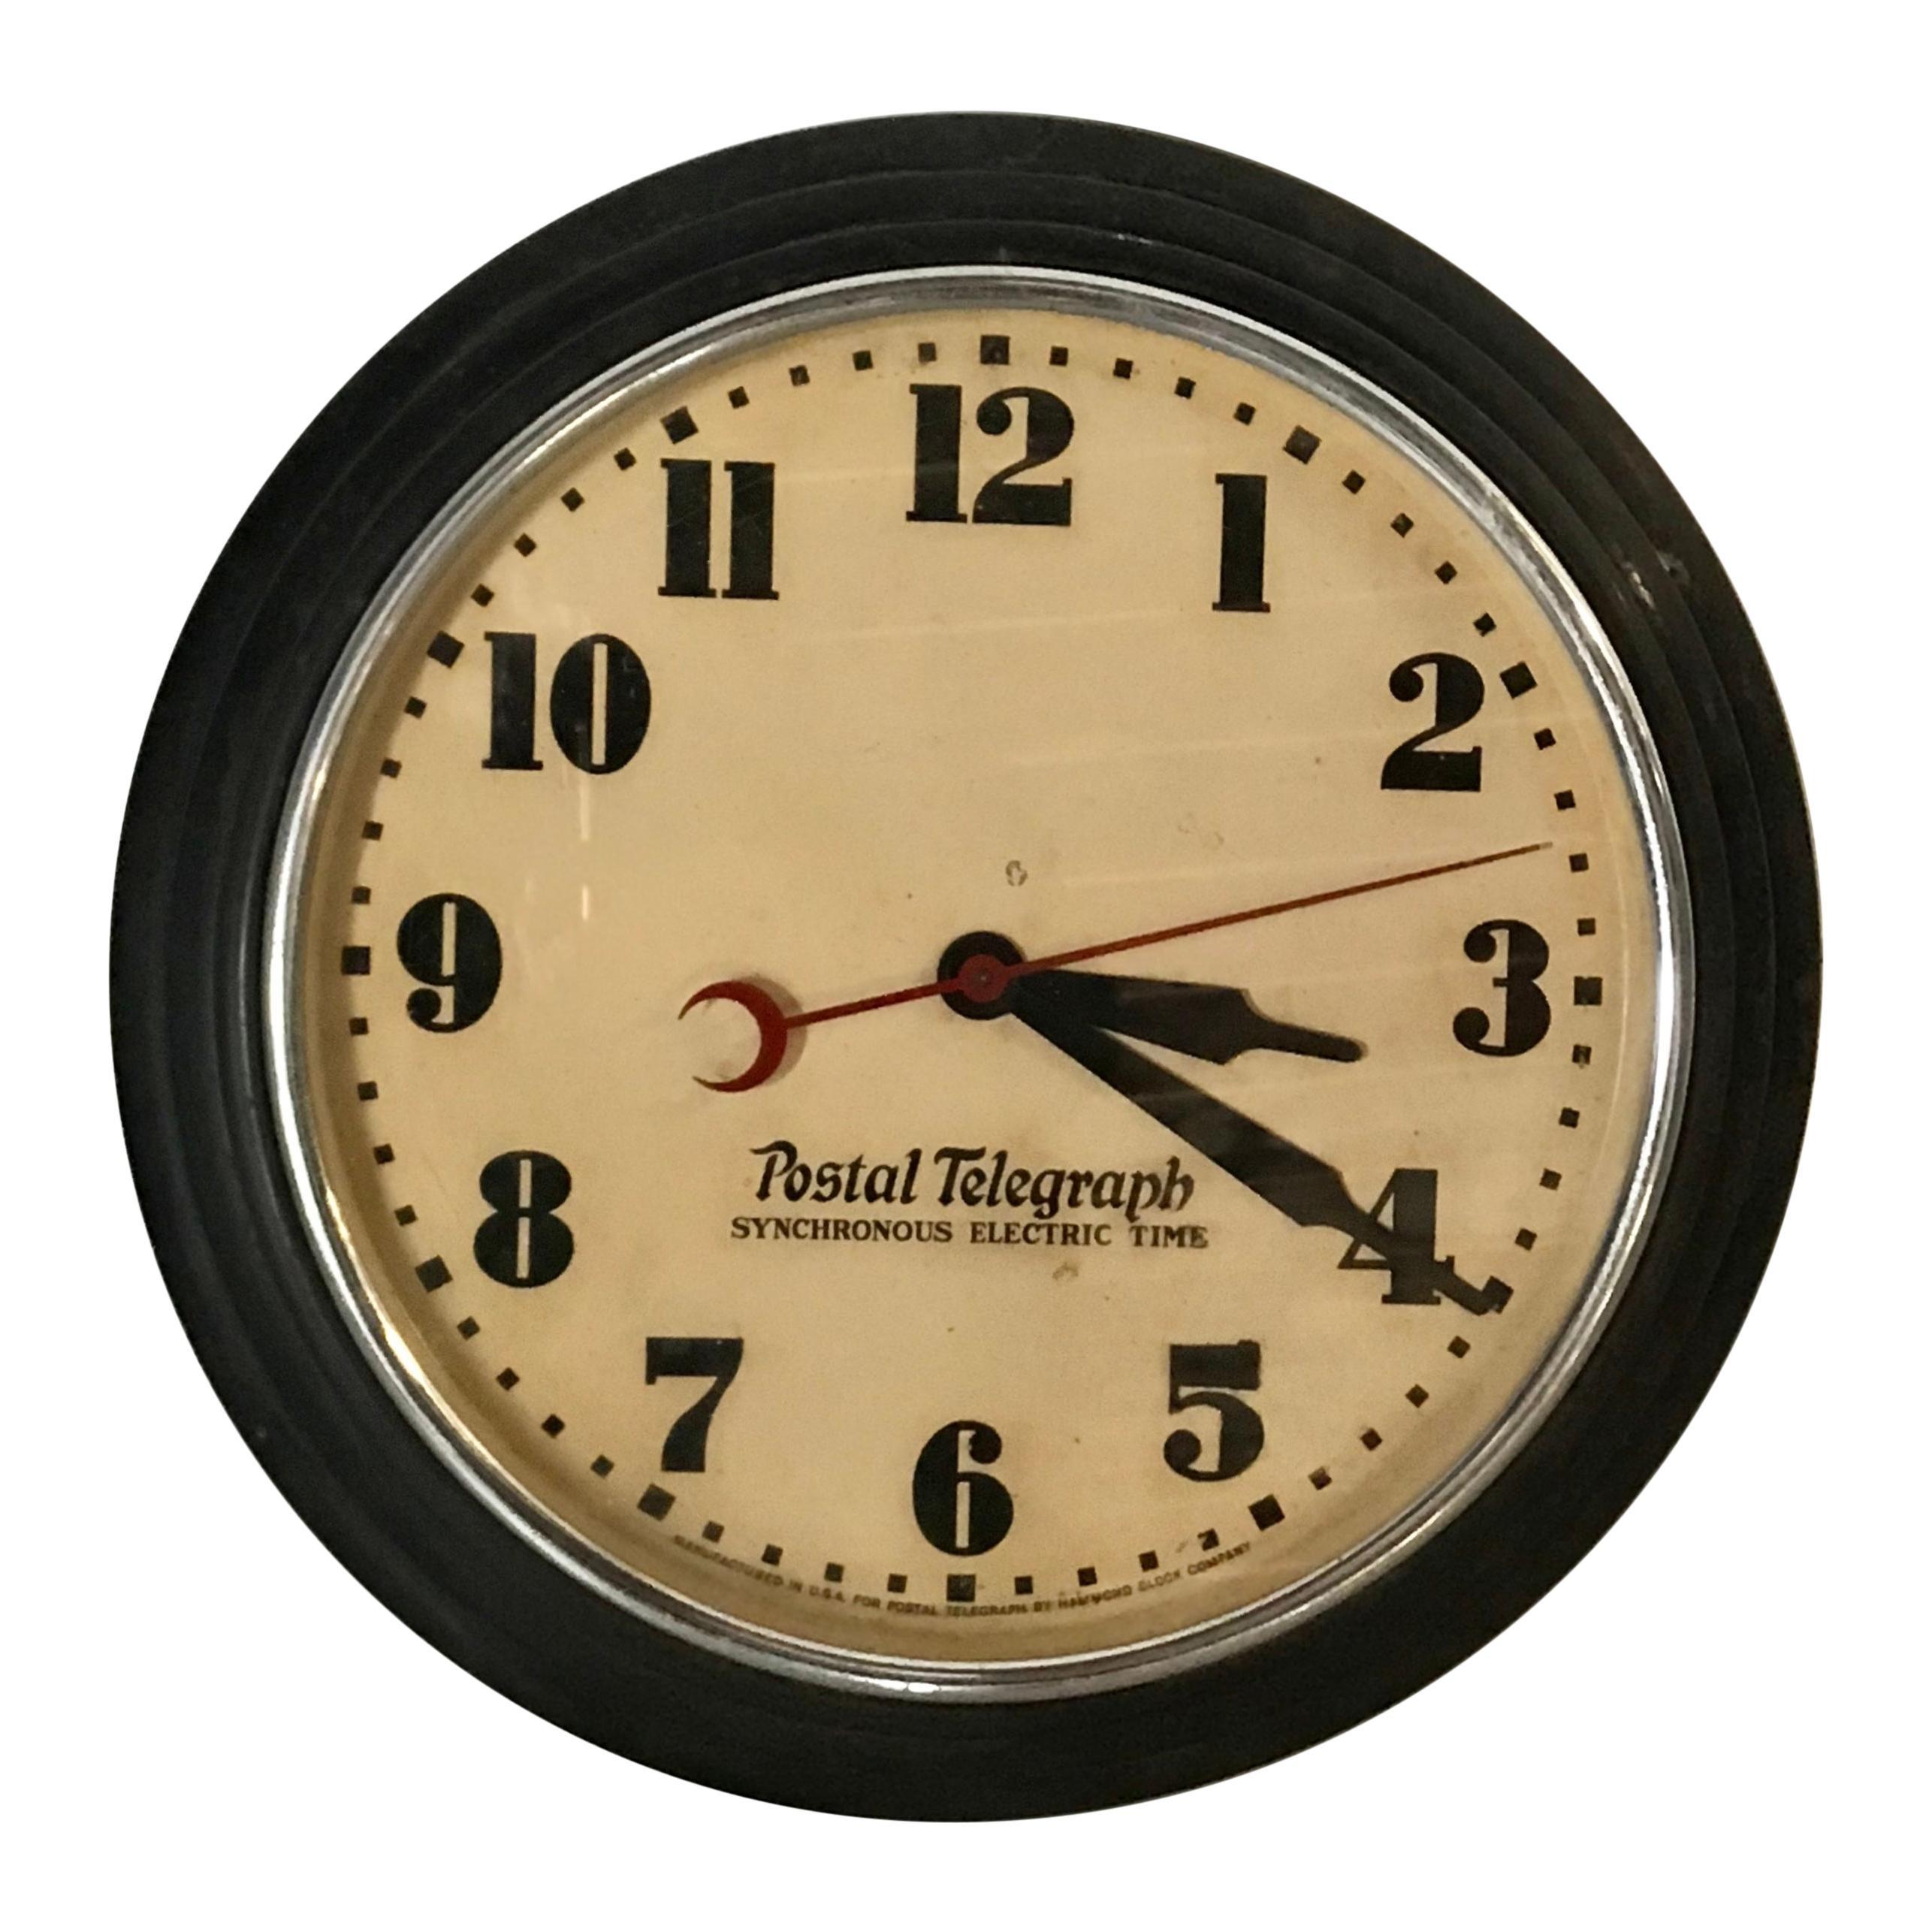 Art Deco Postal Telegraph Wall Clock, Synchronous Hammond Clock Co.